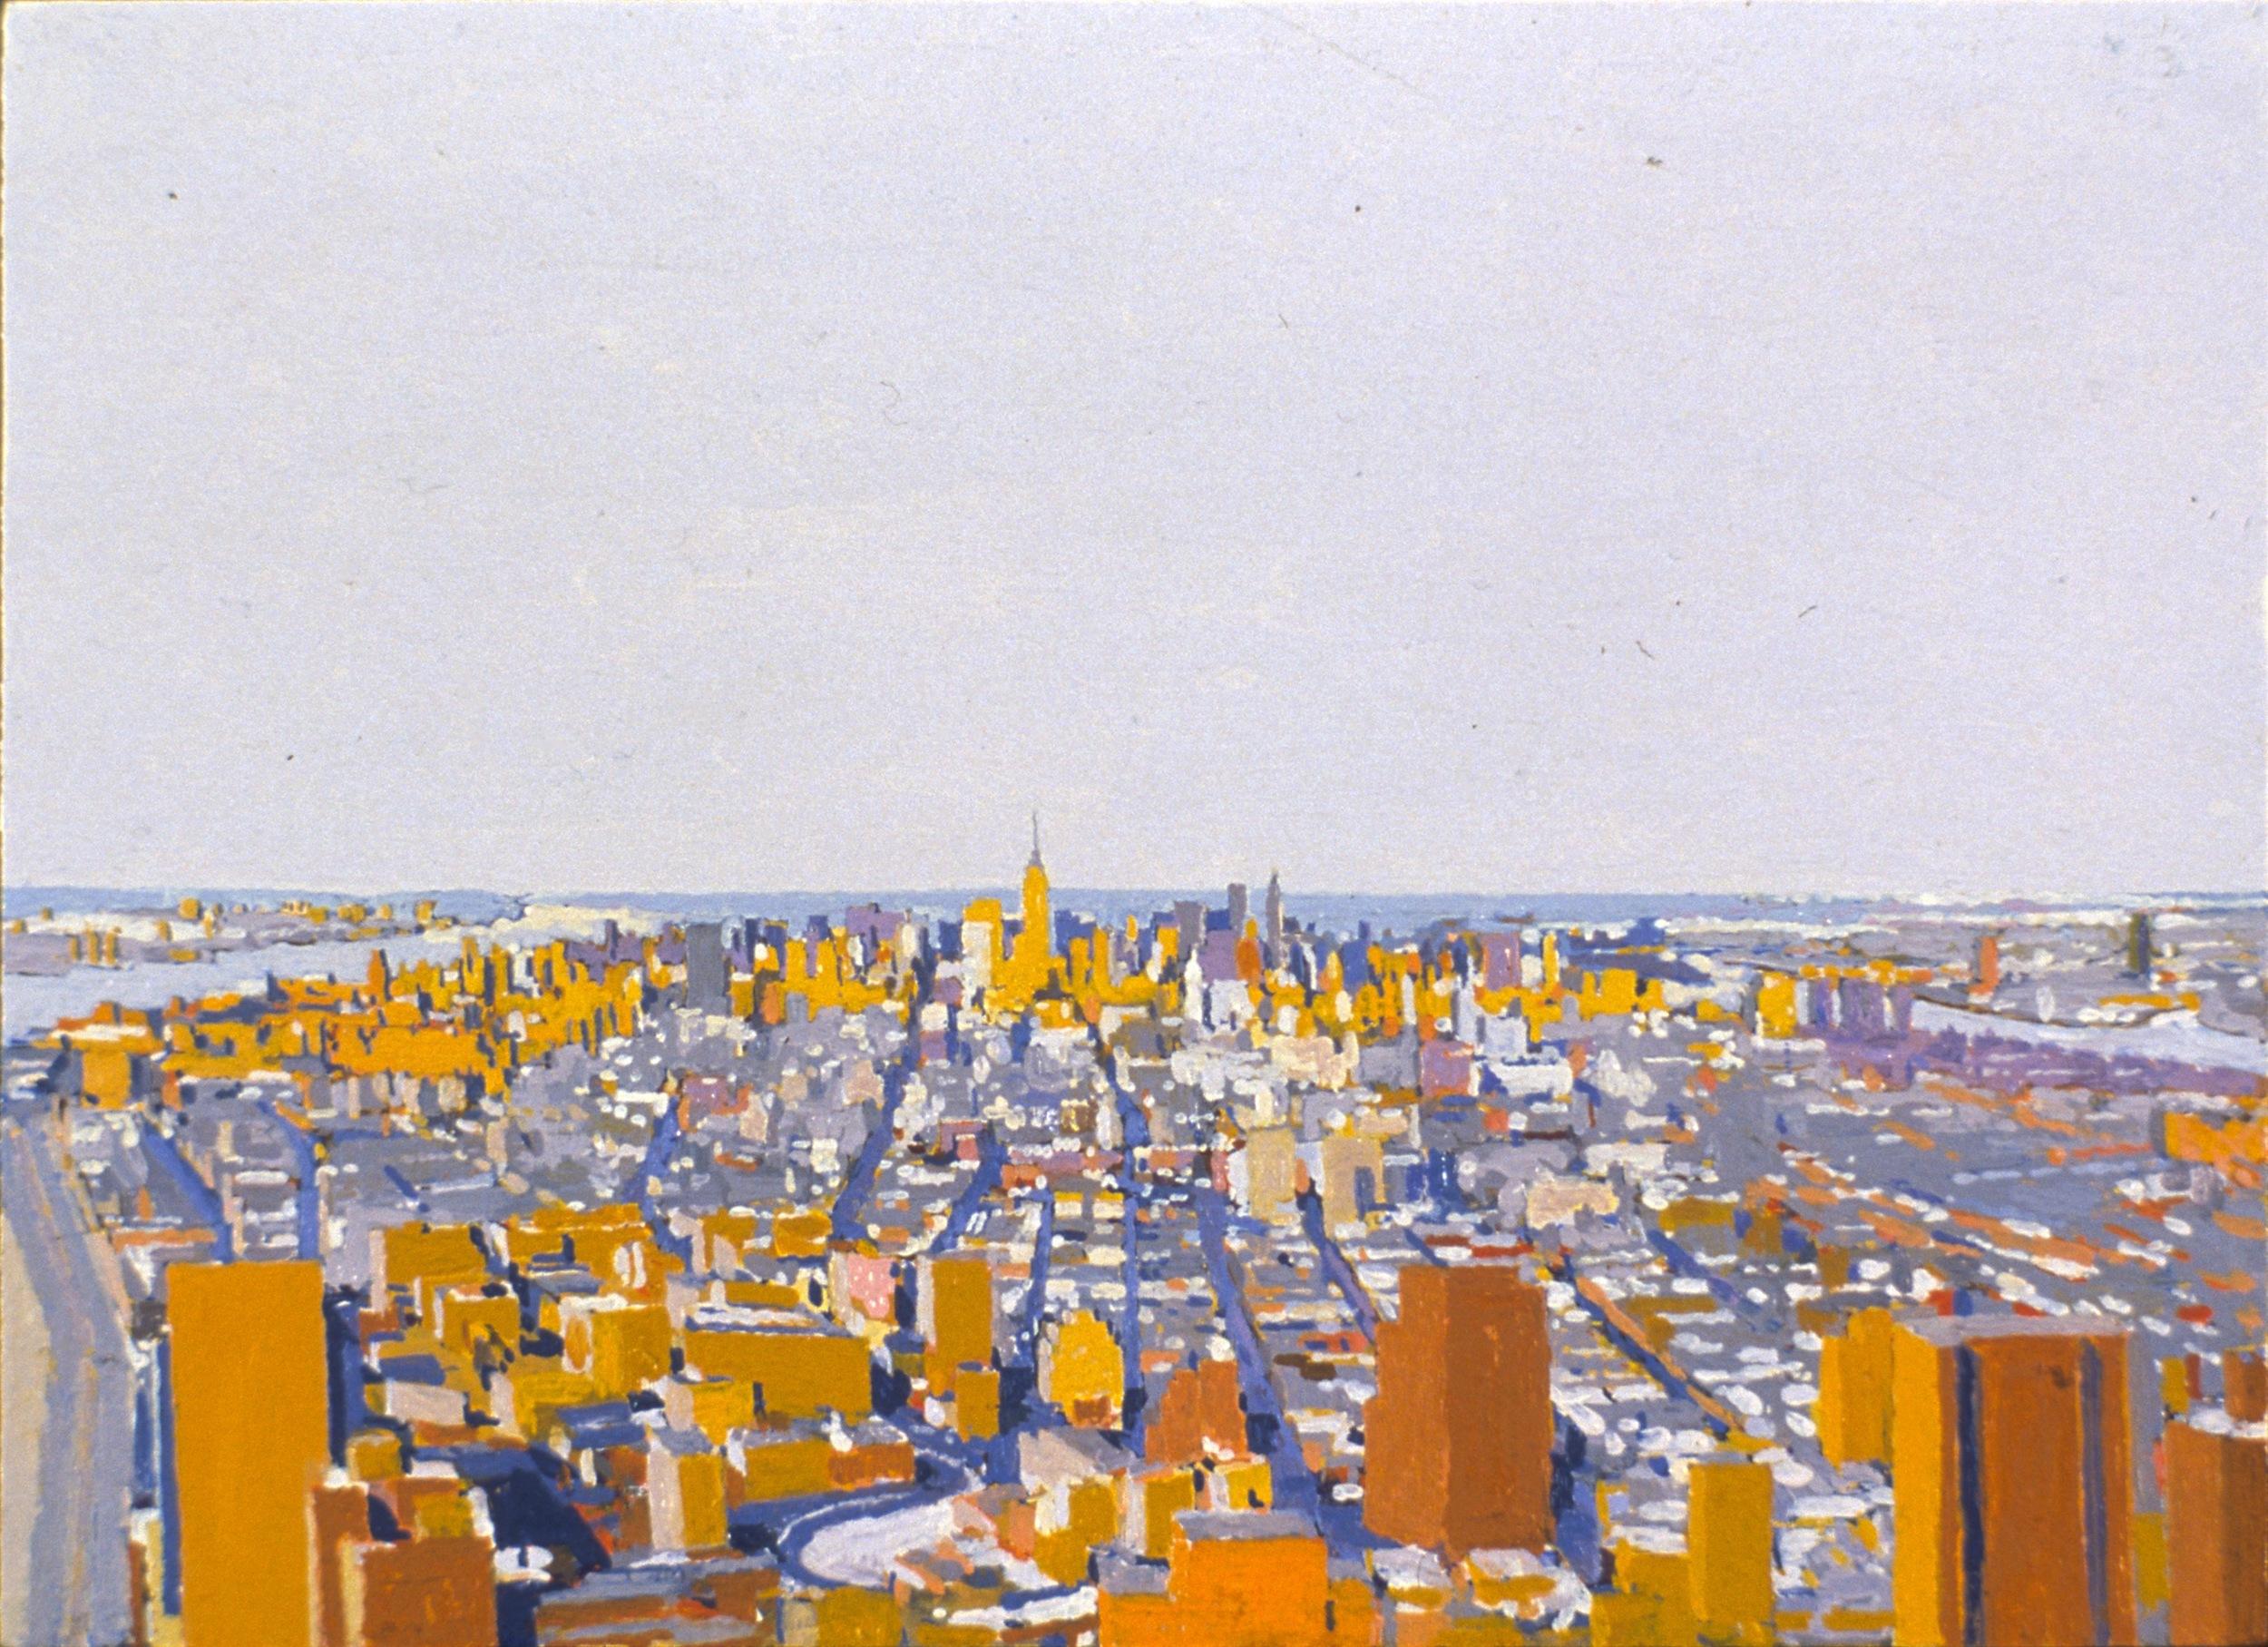 Manhattan III, 1998, oil on panel, 8 x 11 inches